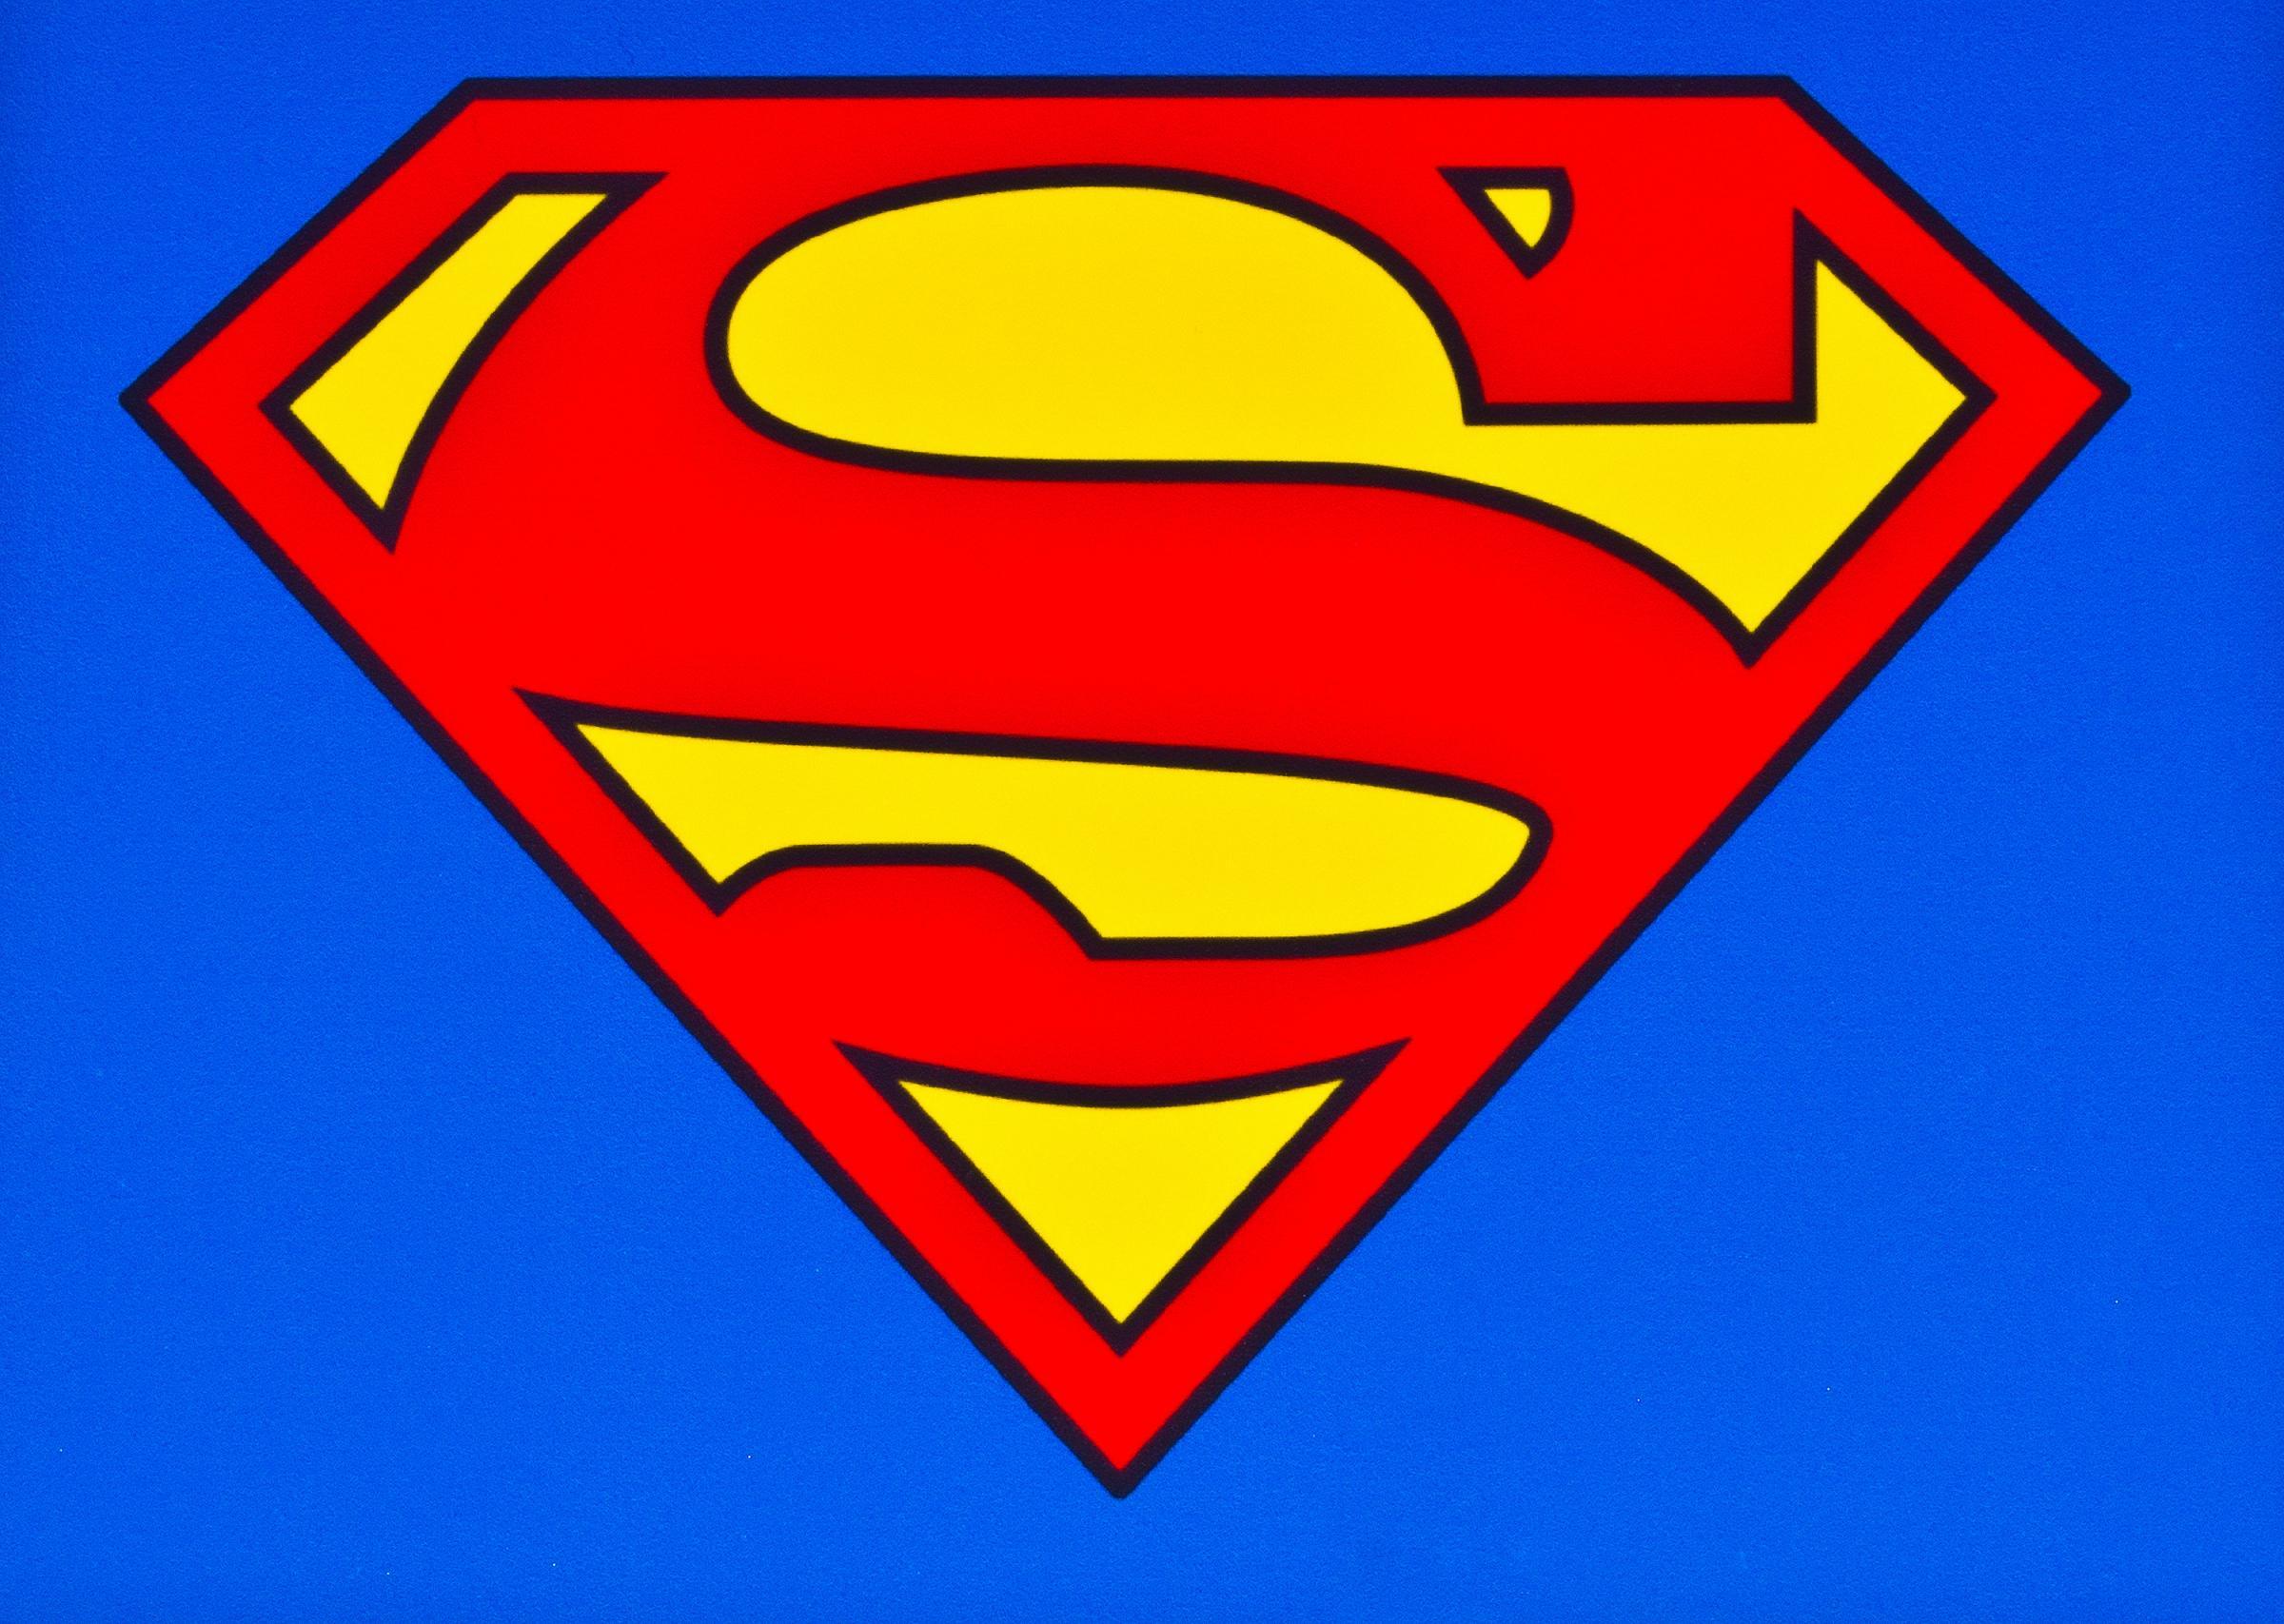 Ohio lawmaker proposes super day for superman wksu ohio lawmaker proposes super day for superman buycottarizona